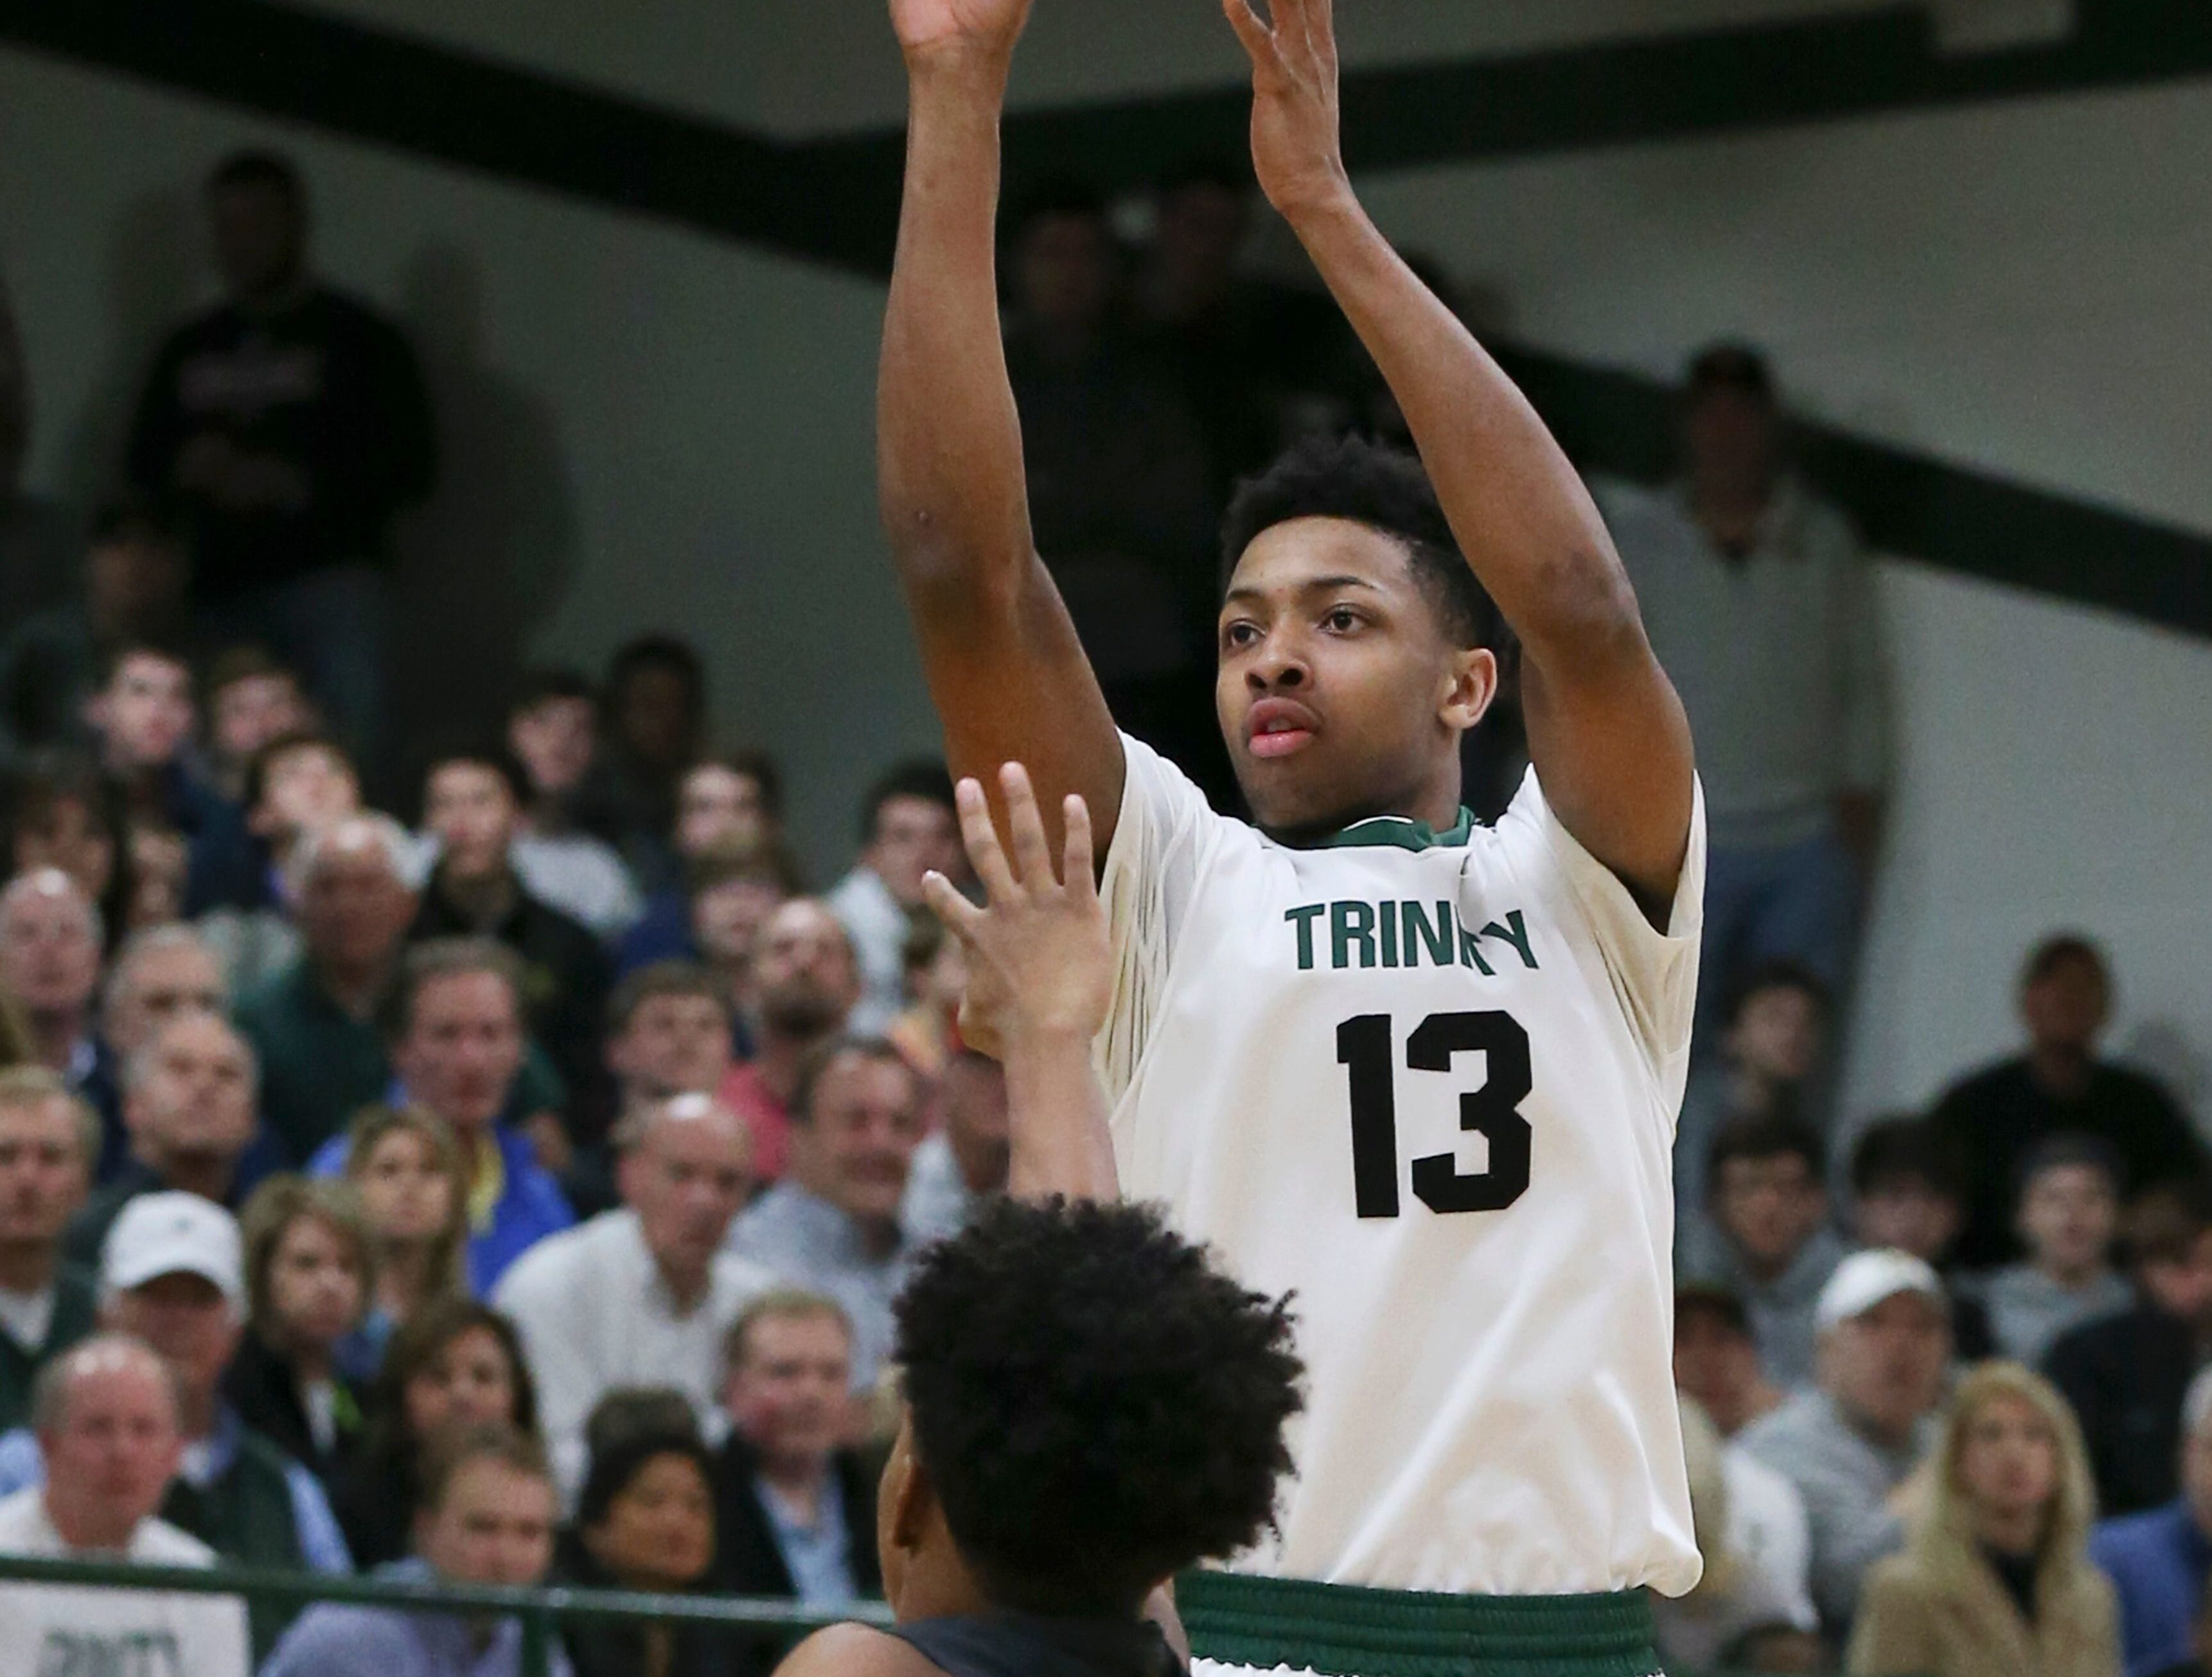 Trinity High basketball star David Johnson plans visit to Louisville